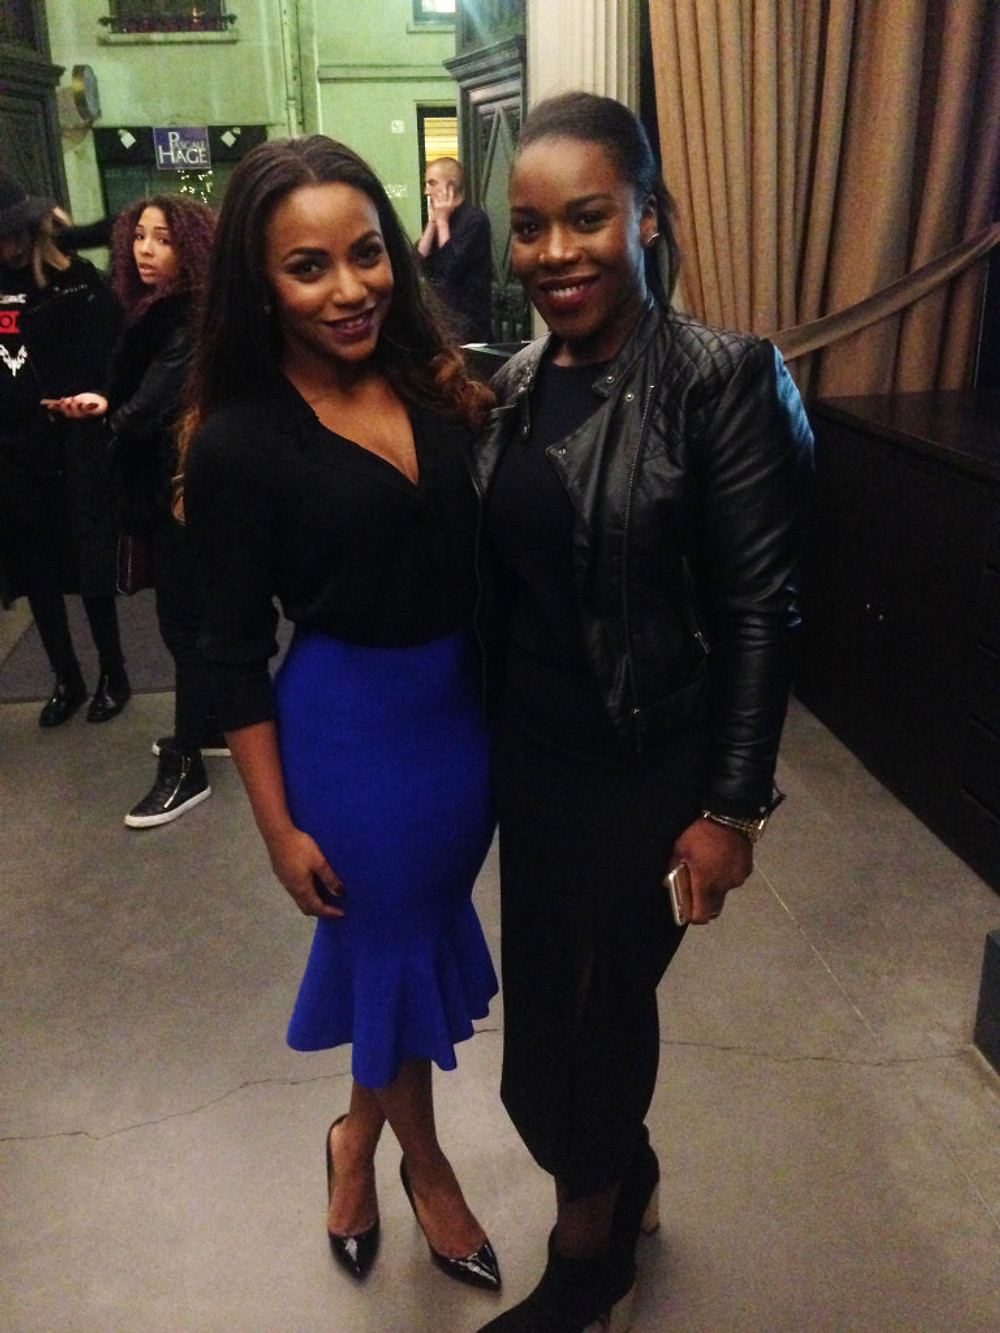 Avec Fatou Diallo du blog BlackInTheAir